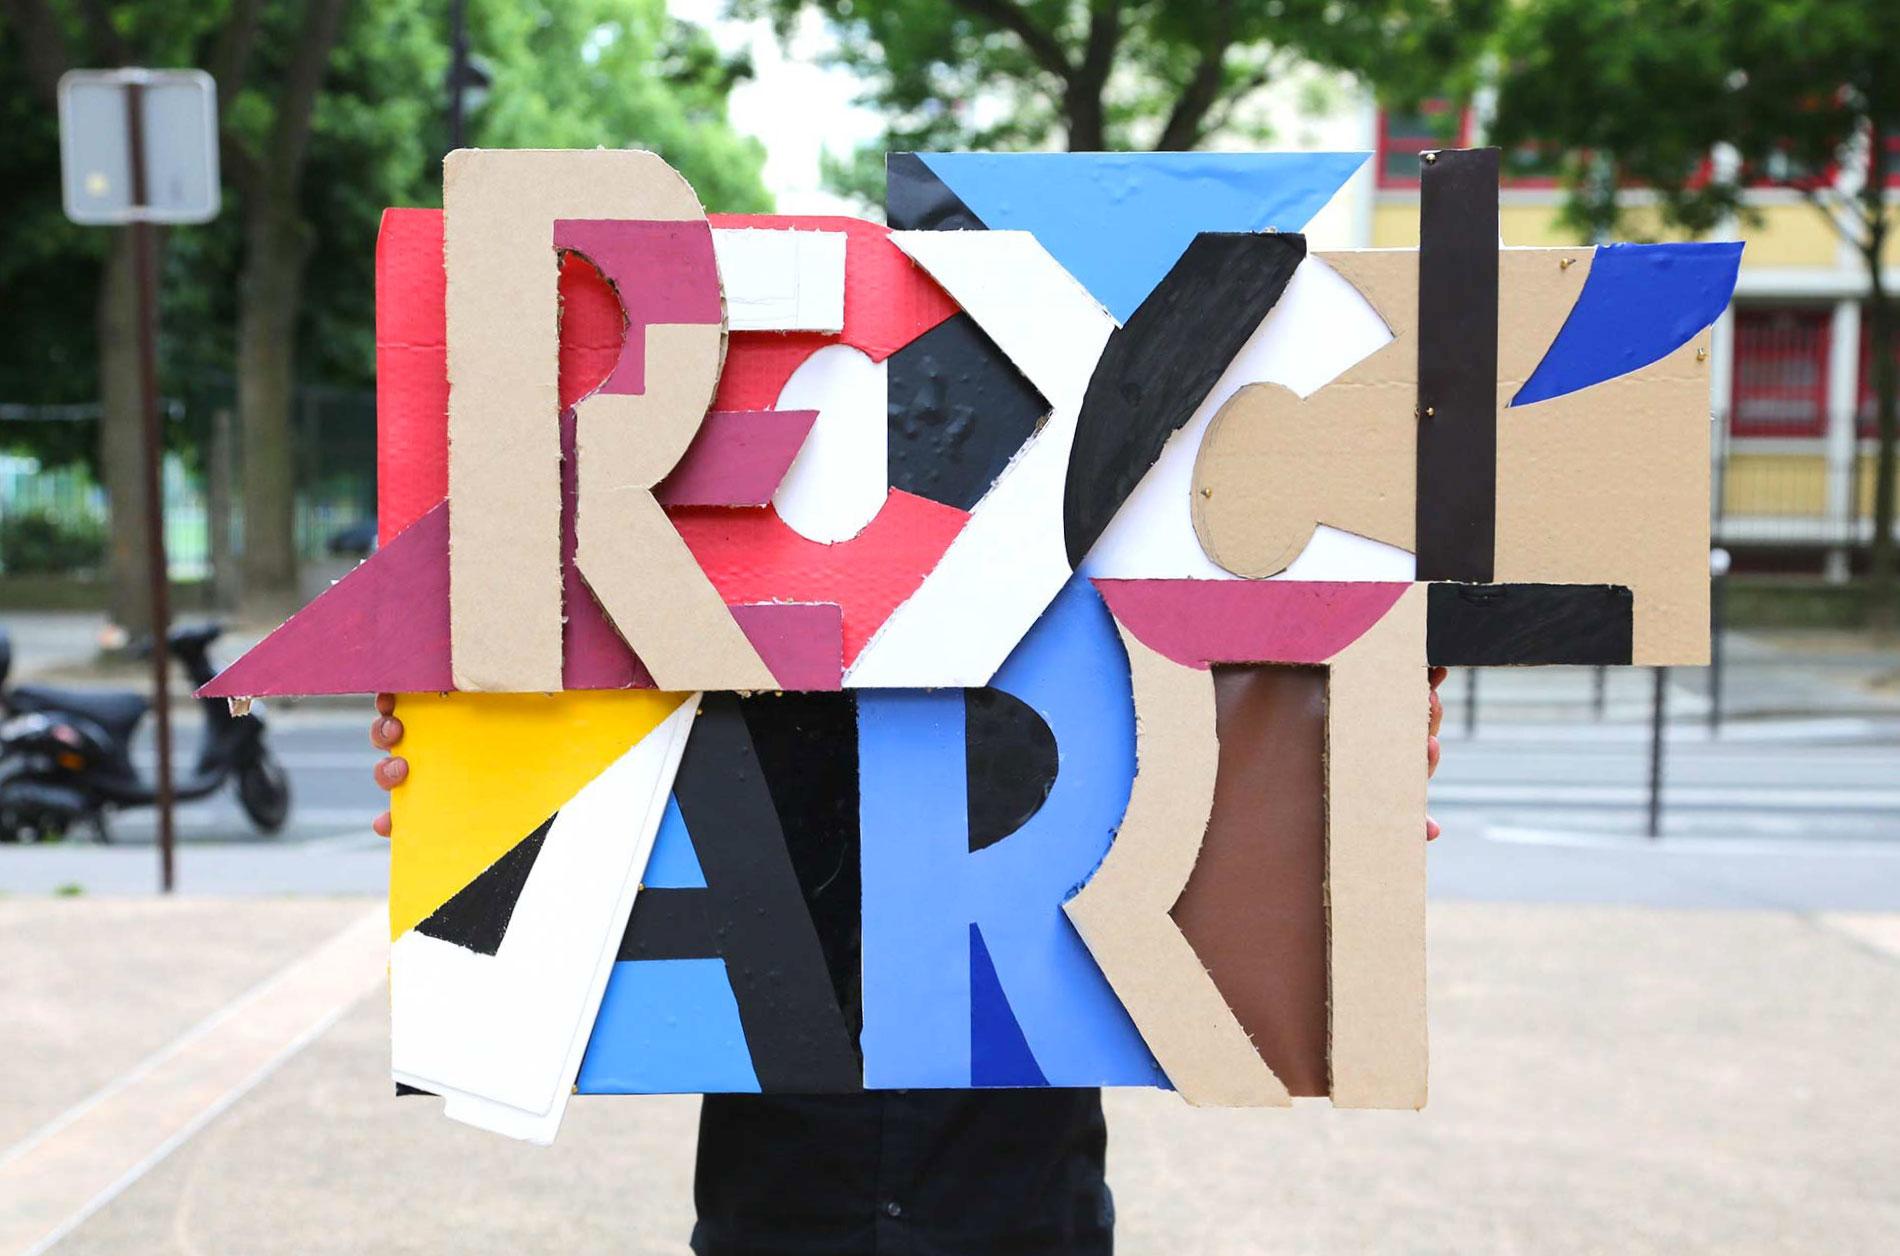 Création artistique issue du recyclage